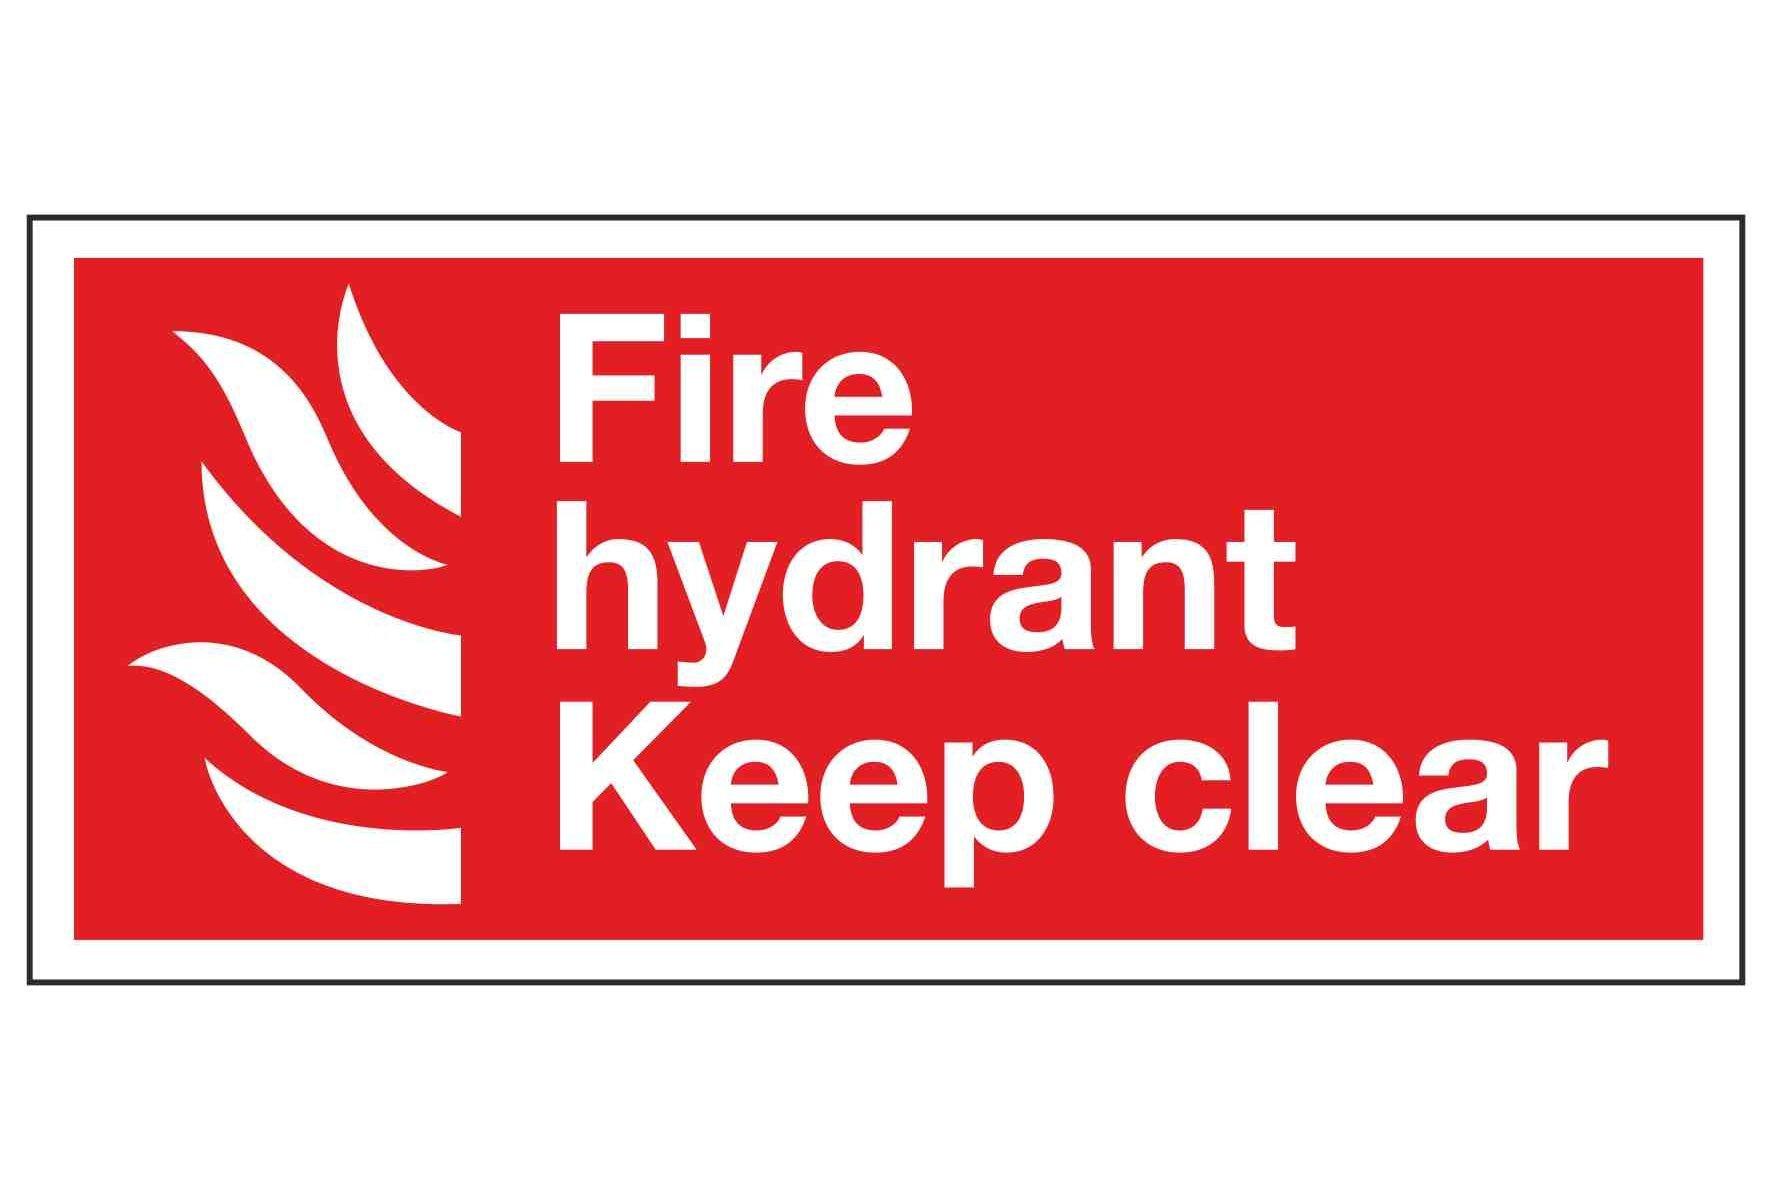 Fire hydrant Keep clear